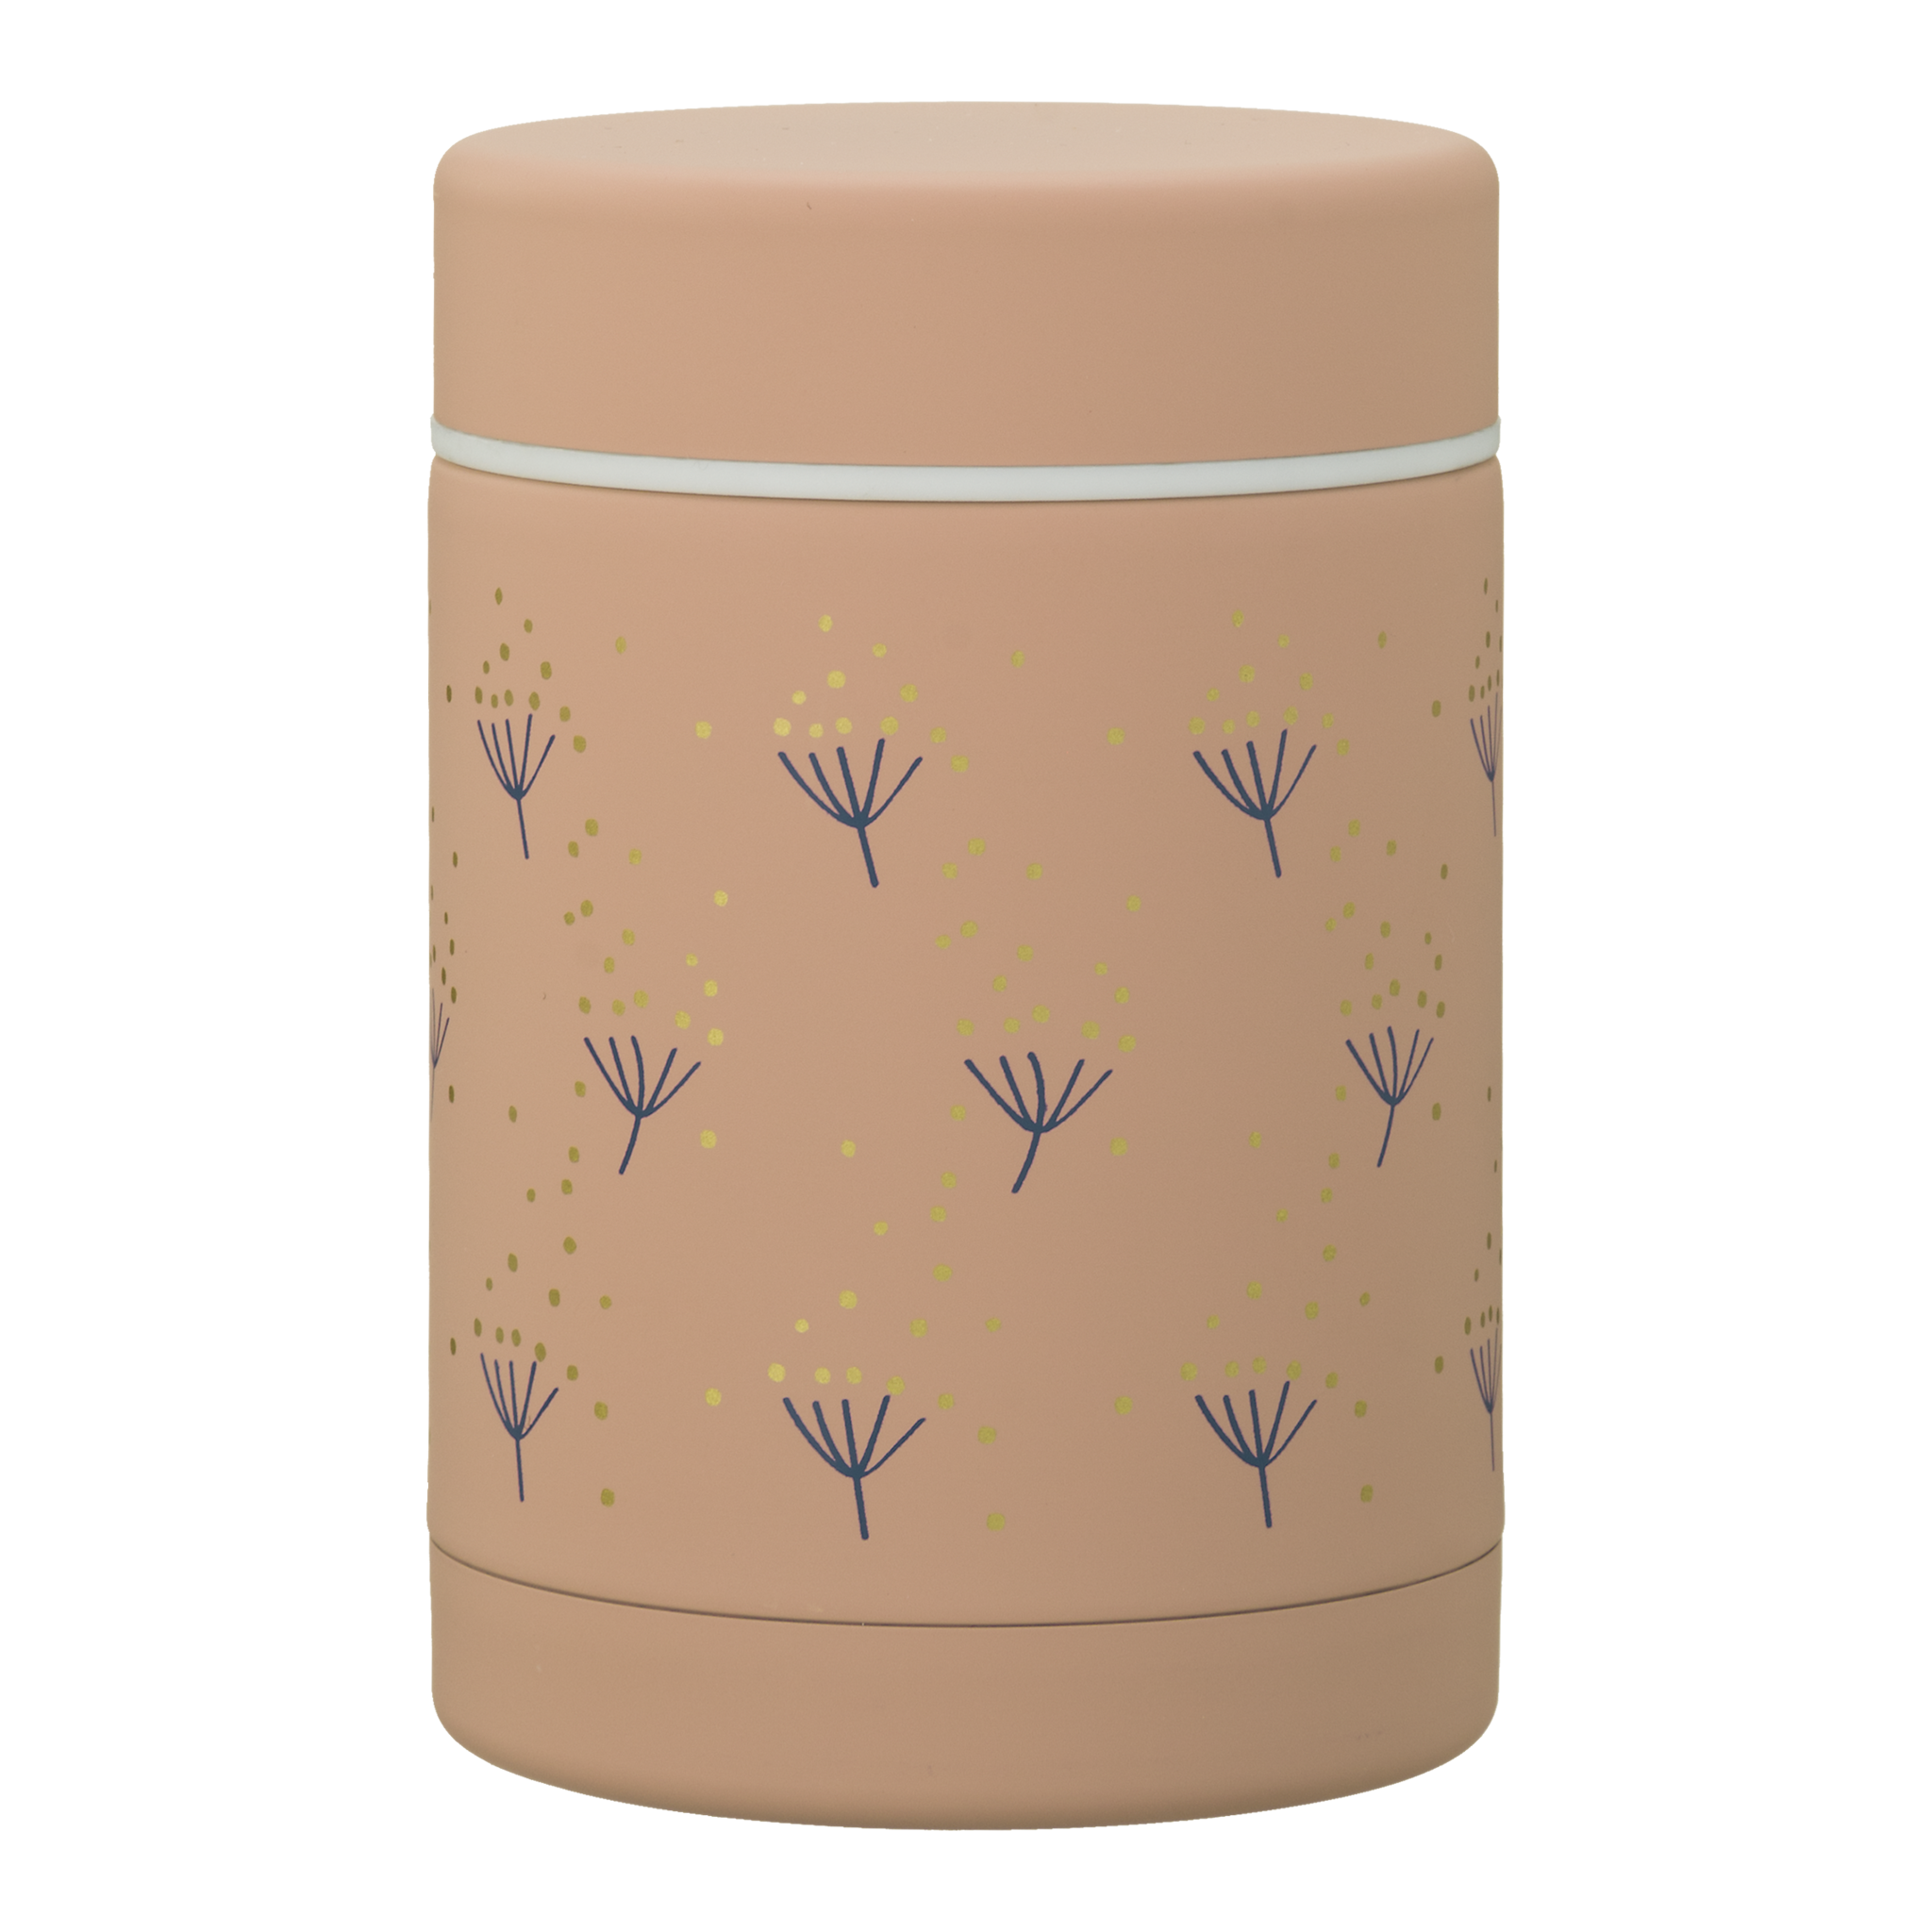 Fresk Thermobehälter 300ml Dandelion